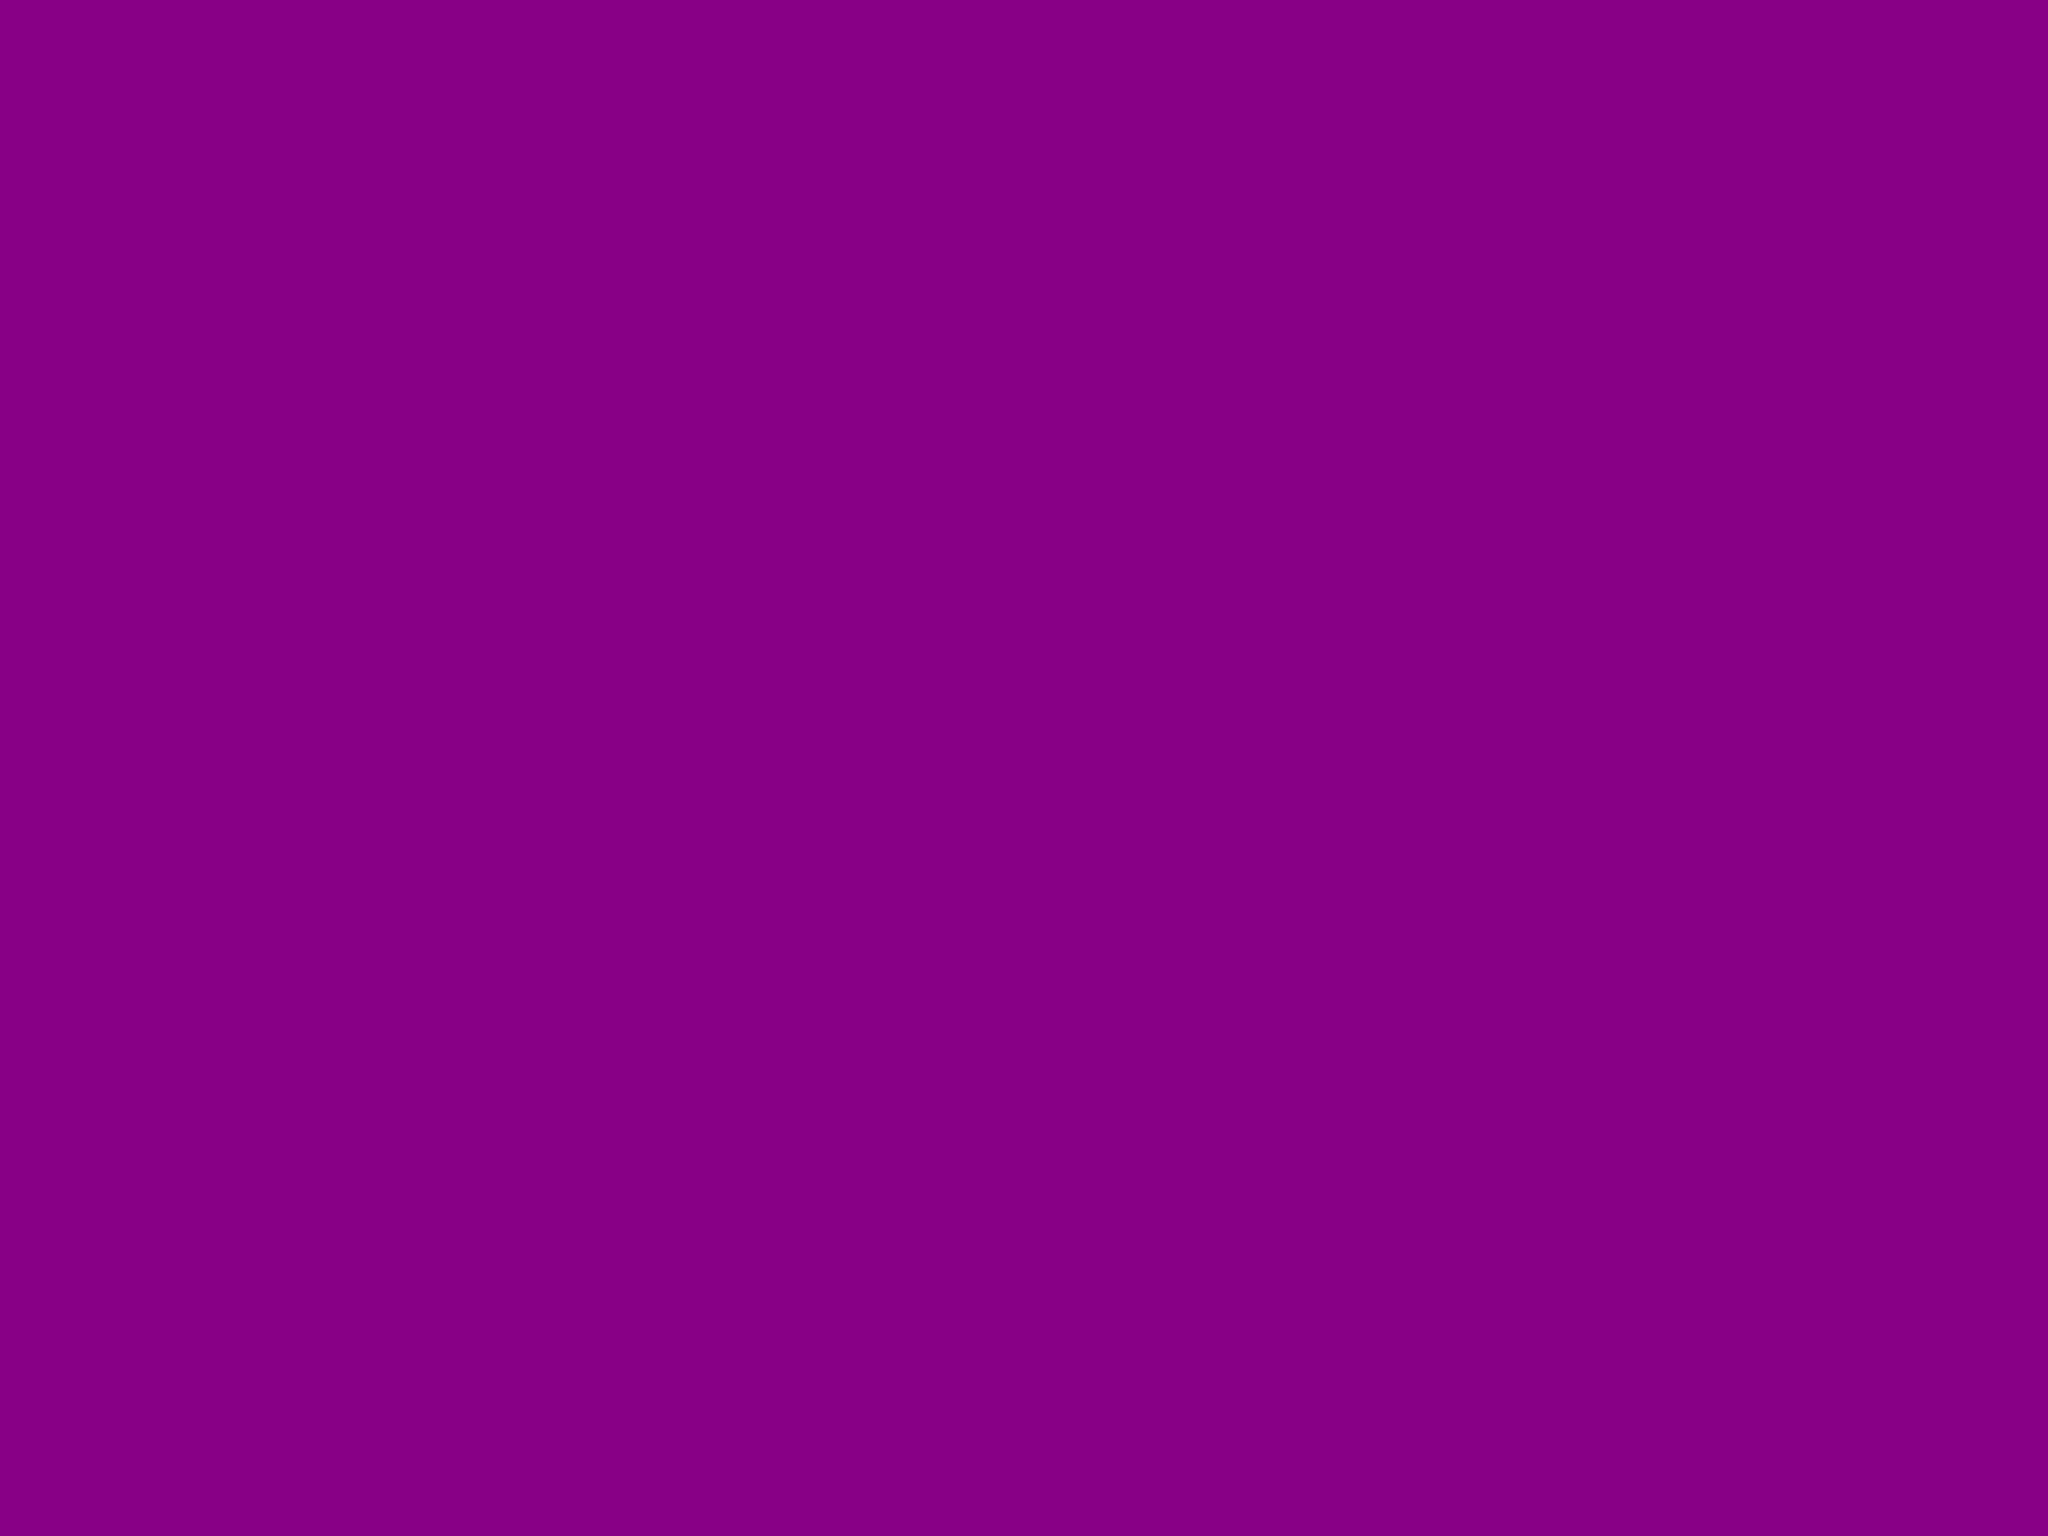 2048x1536 Mardi Gras Solid Color Background